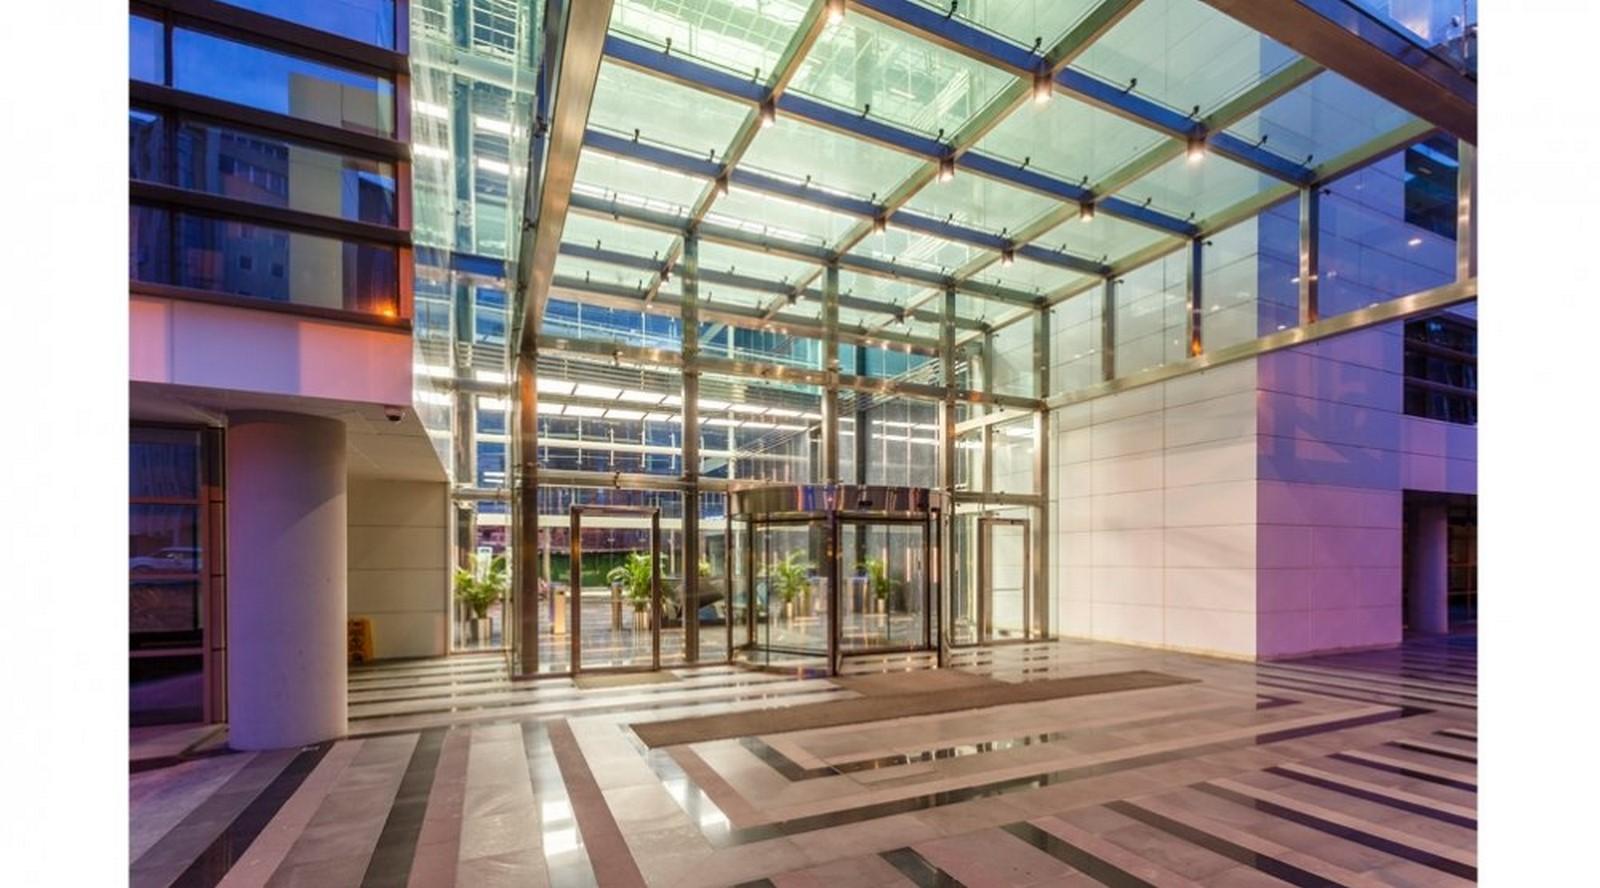 Kazanci Holding Office Building - Sheet1